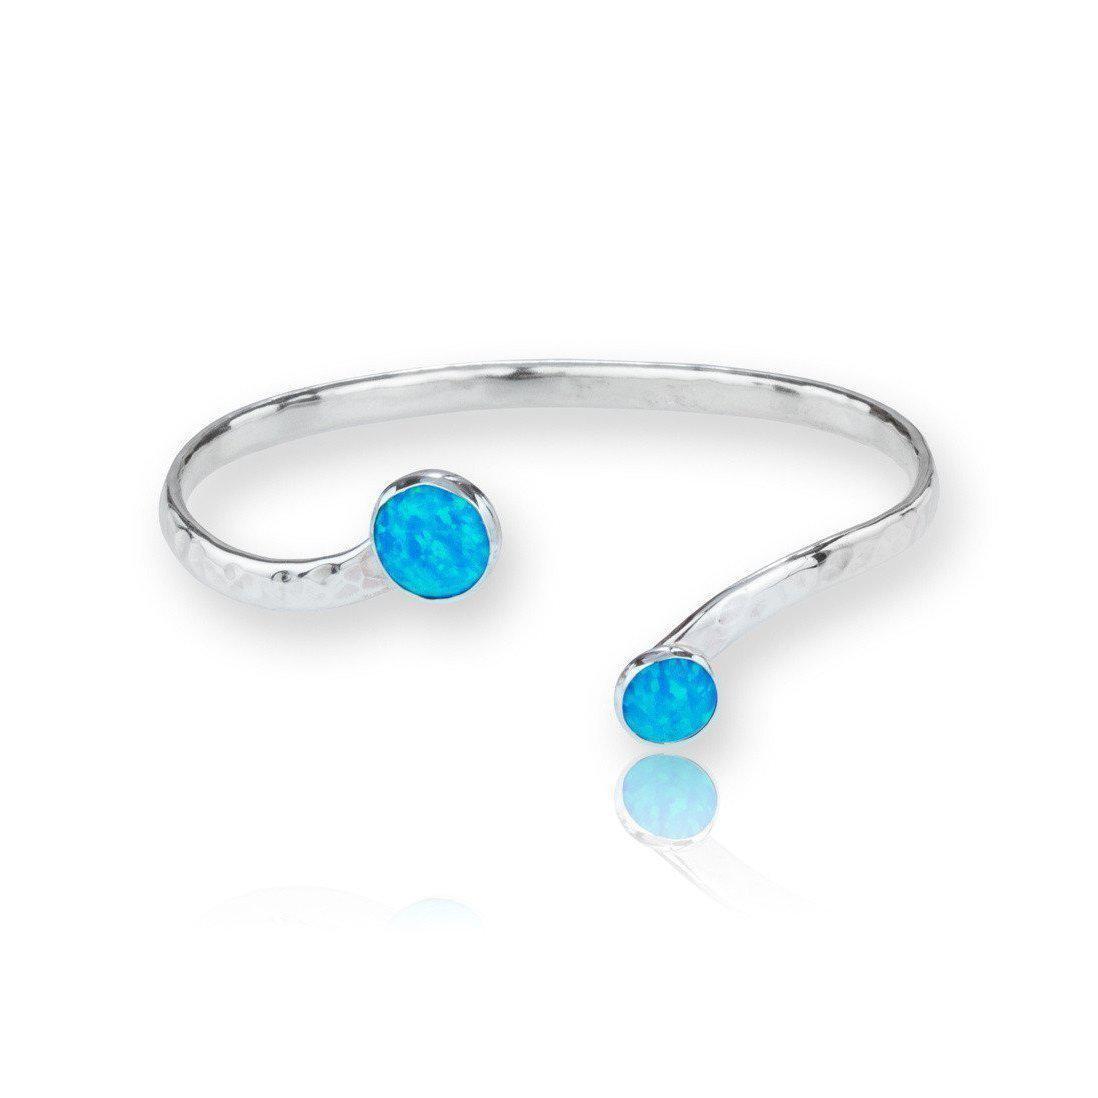 Lavan Gold & Sterling Silver Blue Opal Bangle B1VE3WBaKj